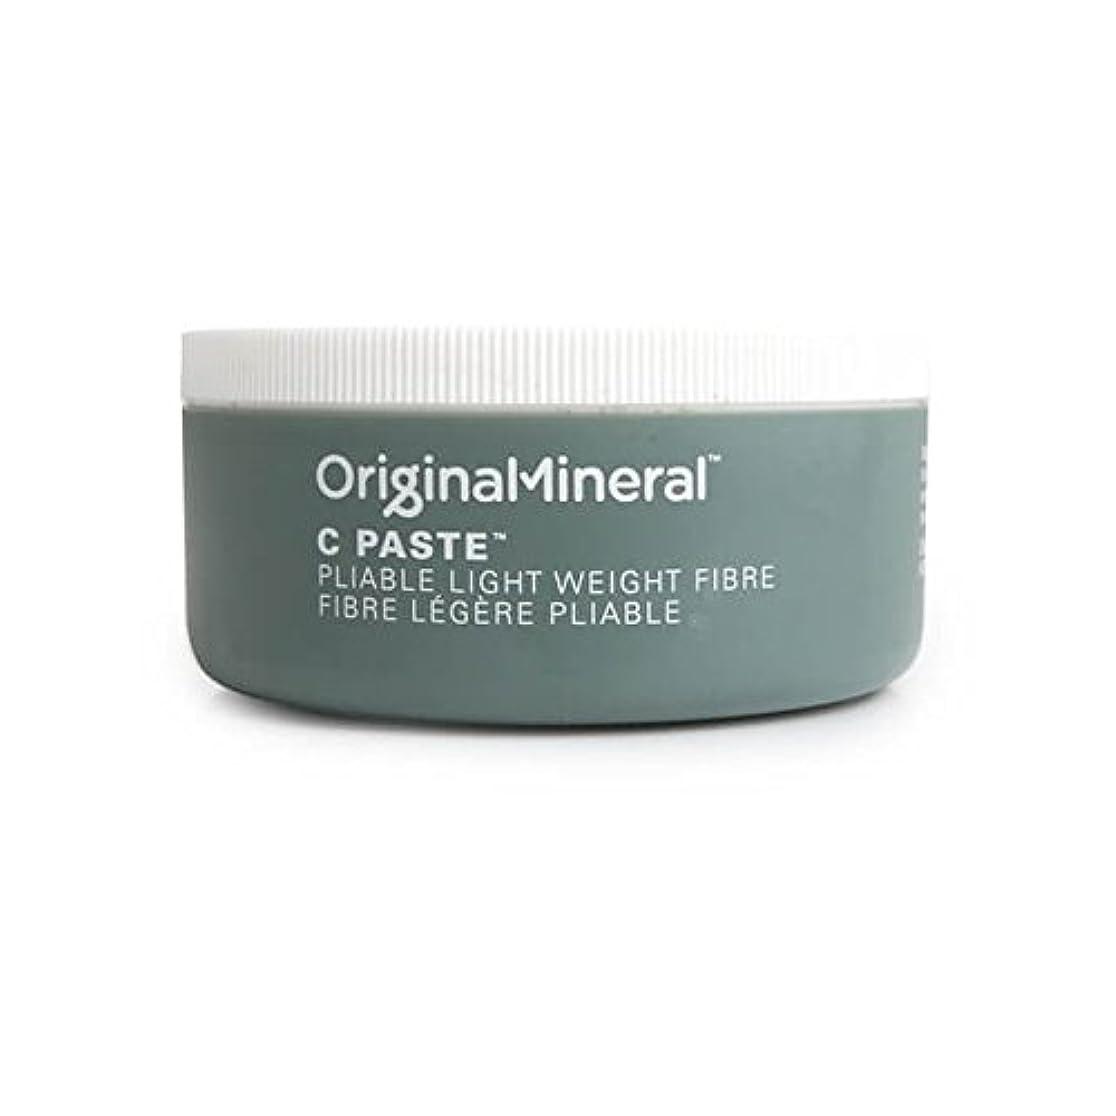 Original & Mineral C-Paste Hair Wax (100G) (Pack of 6) - オリジナル&ミネラルの-ペーストヘアワックス(100グラム) x6 [並行輸入品]